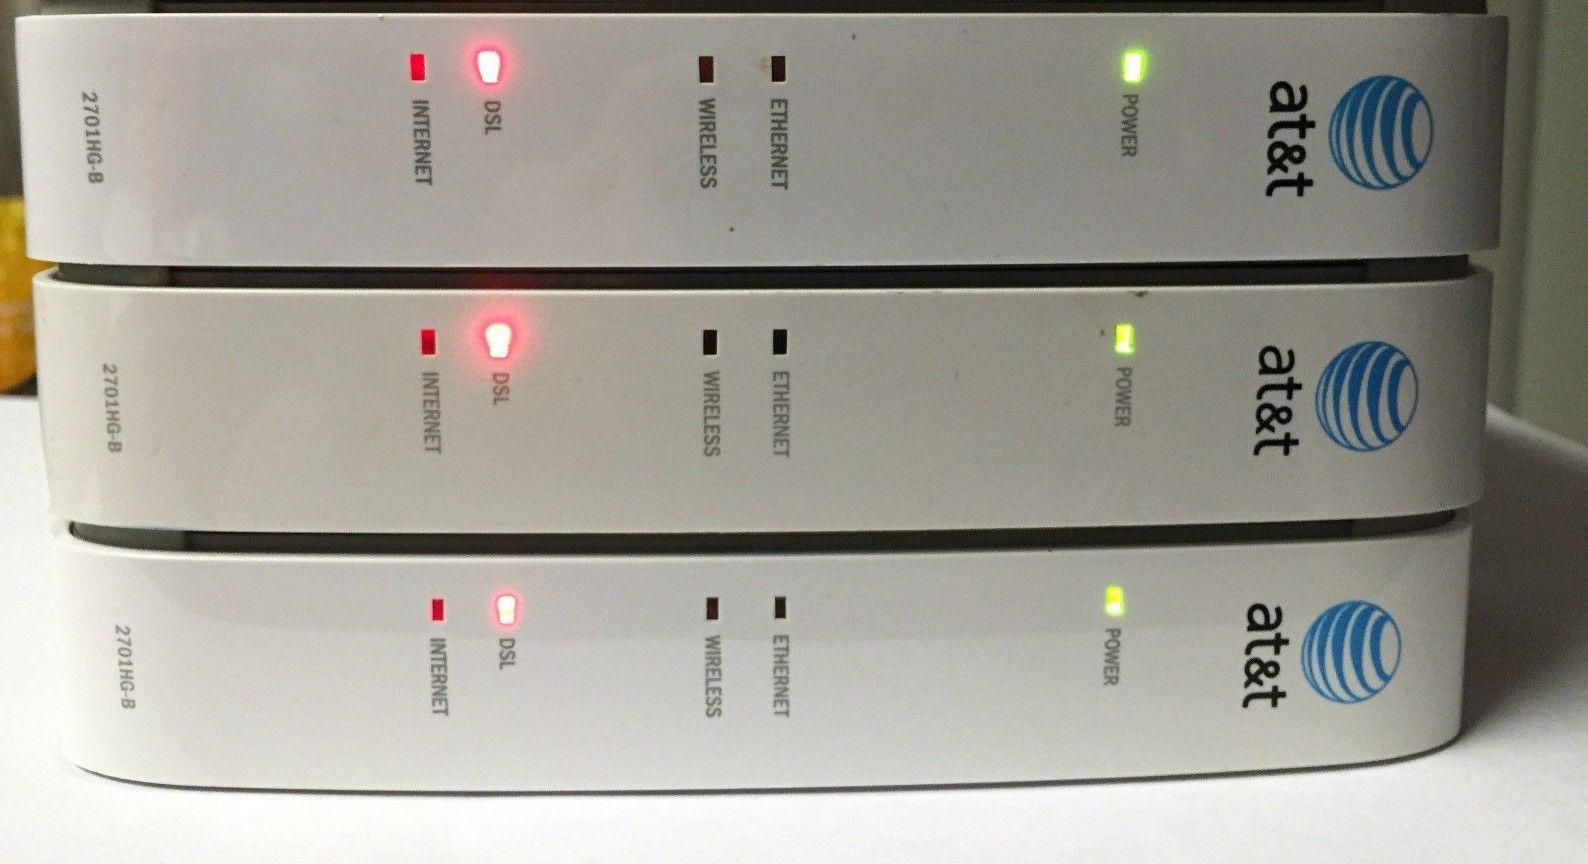 x3 - AT T 2WIRE 2701HG B Gateway WIRELESS modem ROUTER DSL WiFi ...